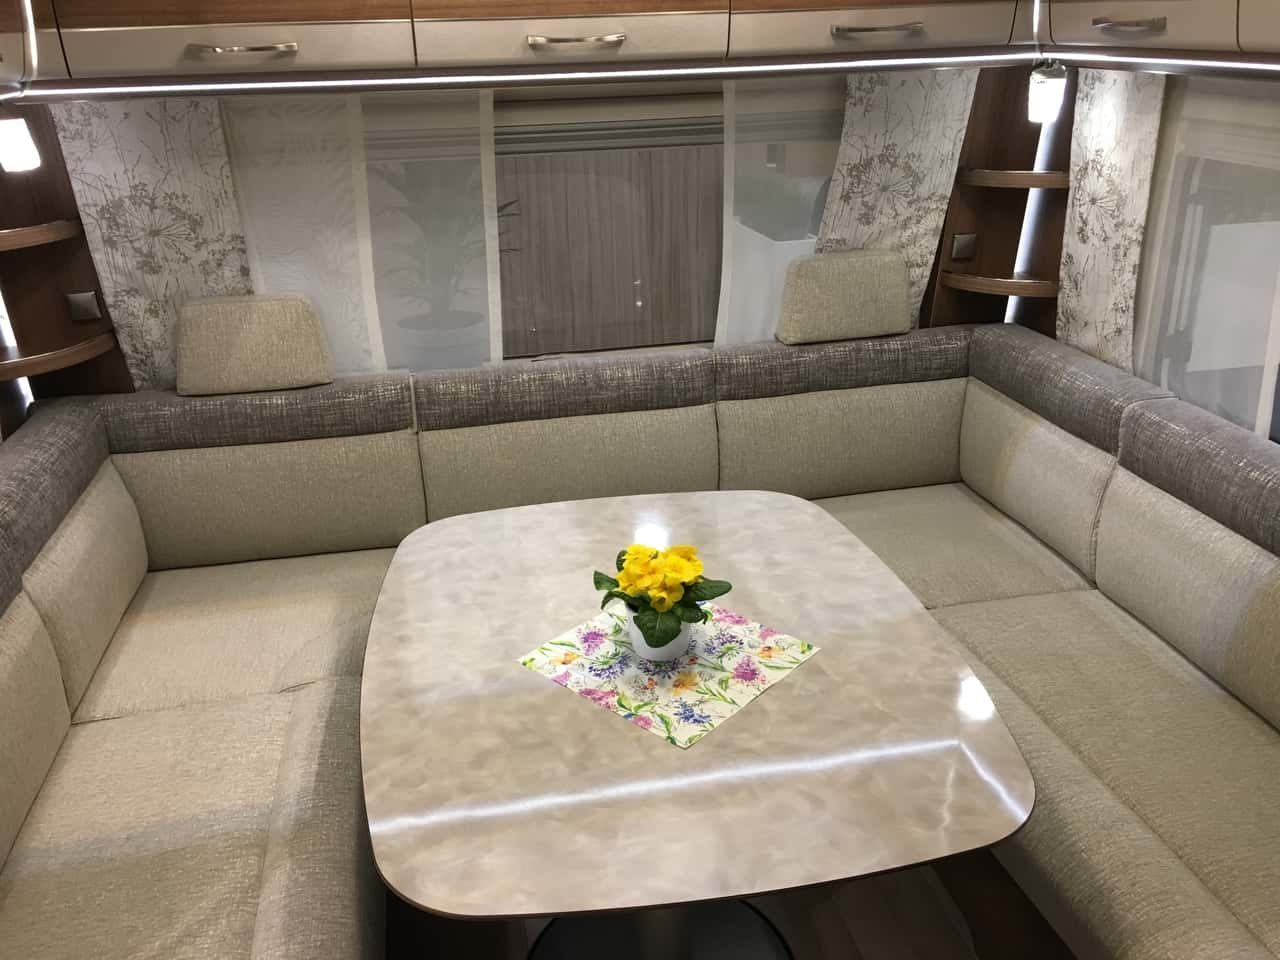 faltcaravan vs wohnwagen der ultimative vergleich. Black Bedroom Furniture Sets. Home Design Ideas